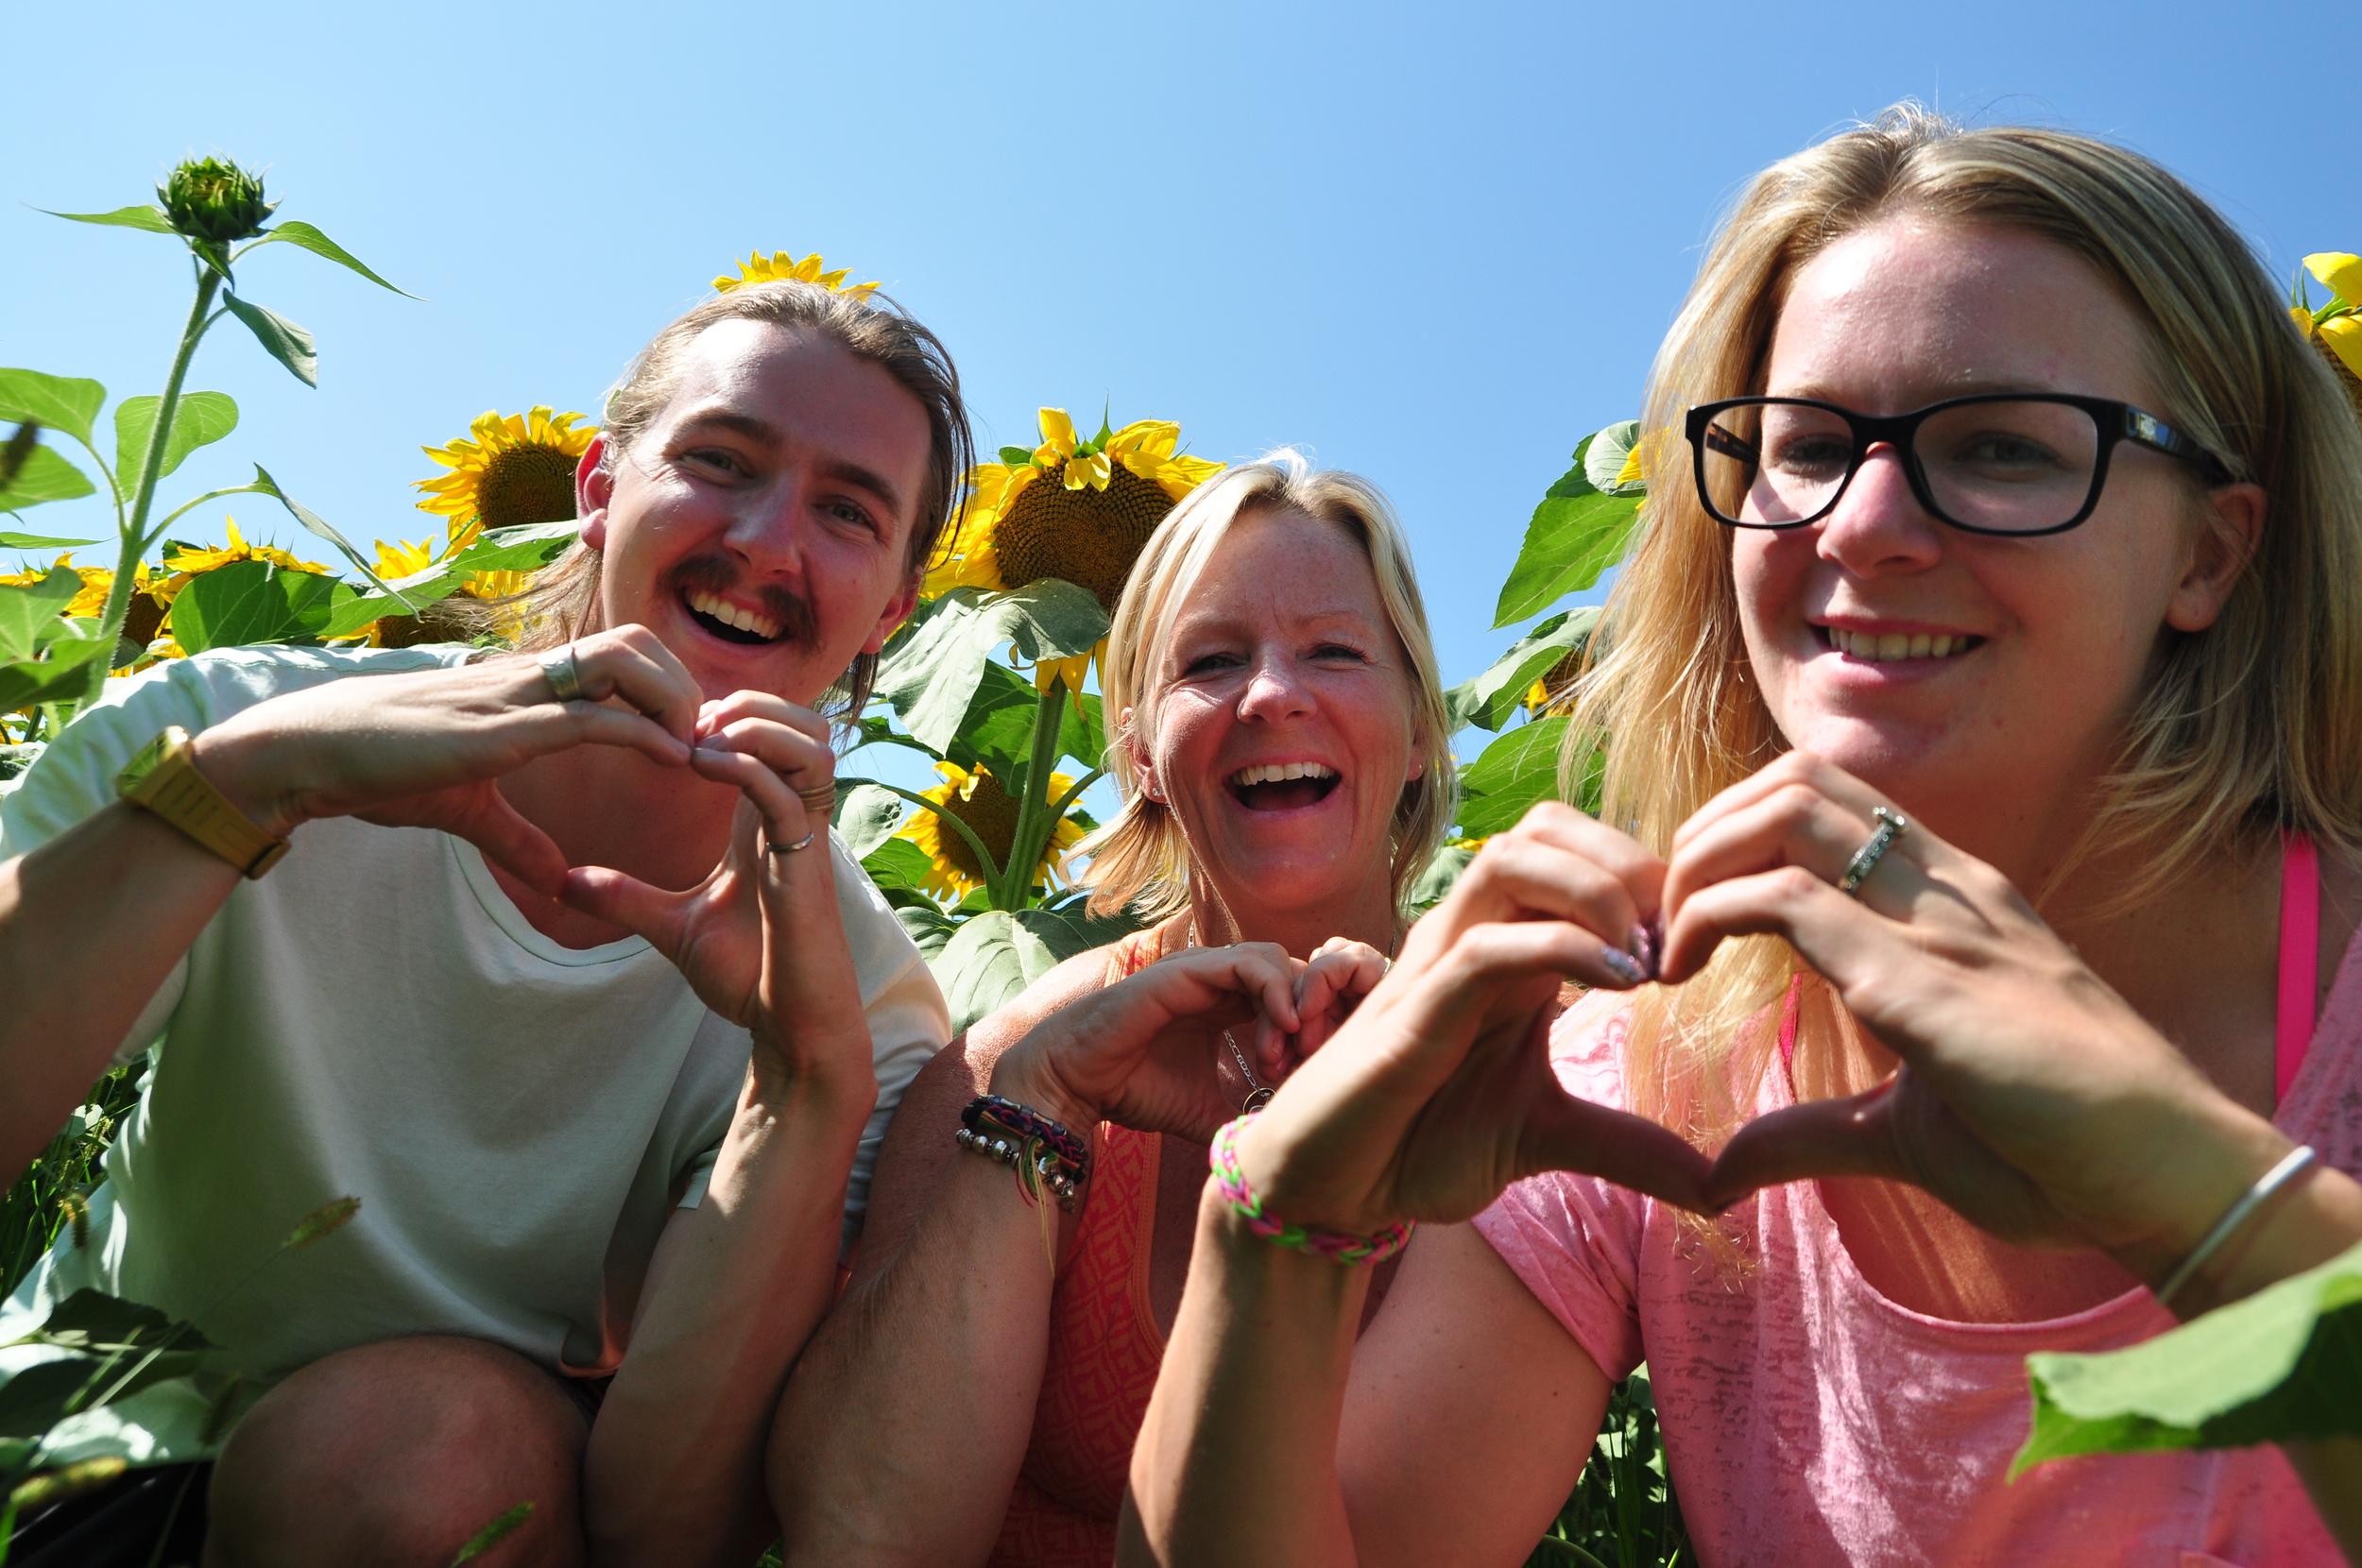 Amongst the sunflowers in North Dakota. (Photo: Michael Freeman)